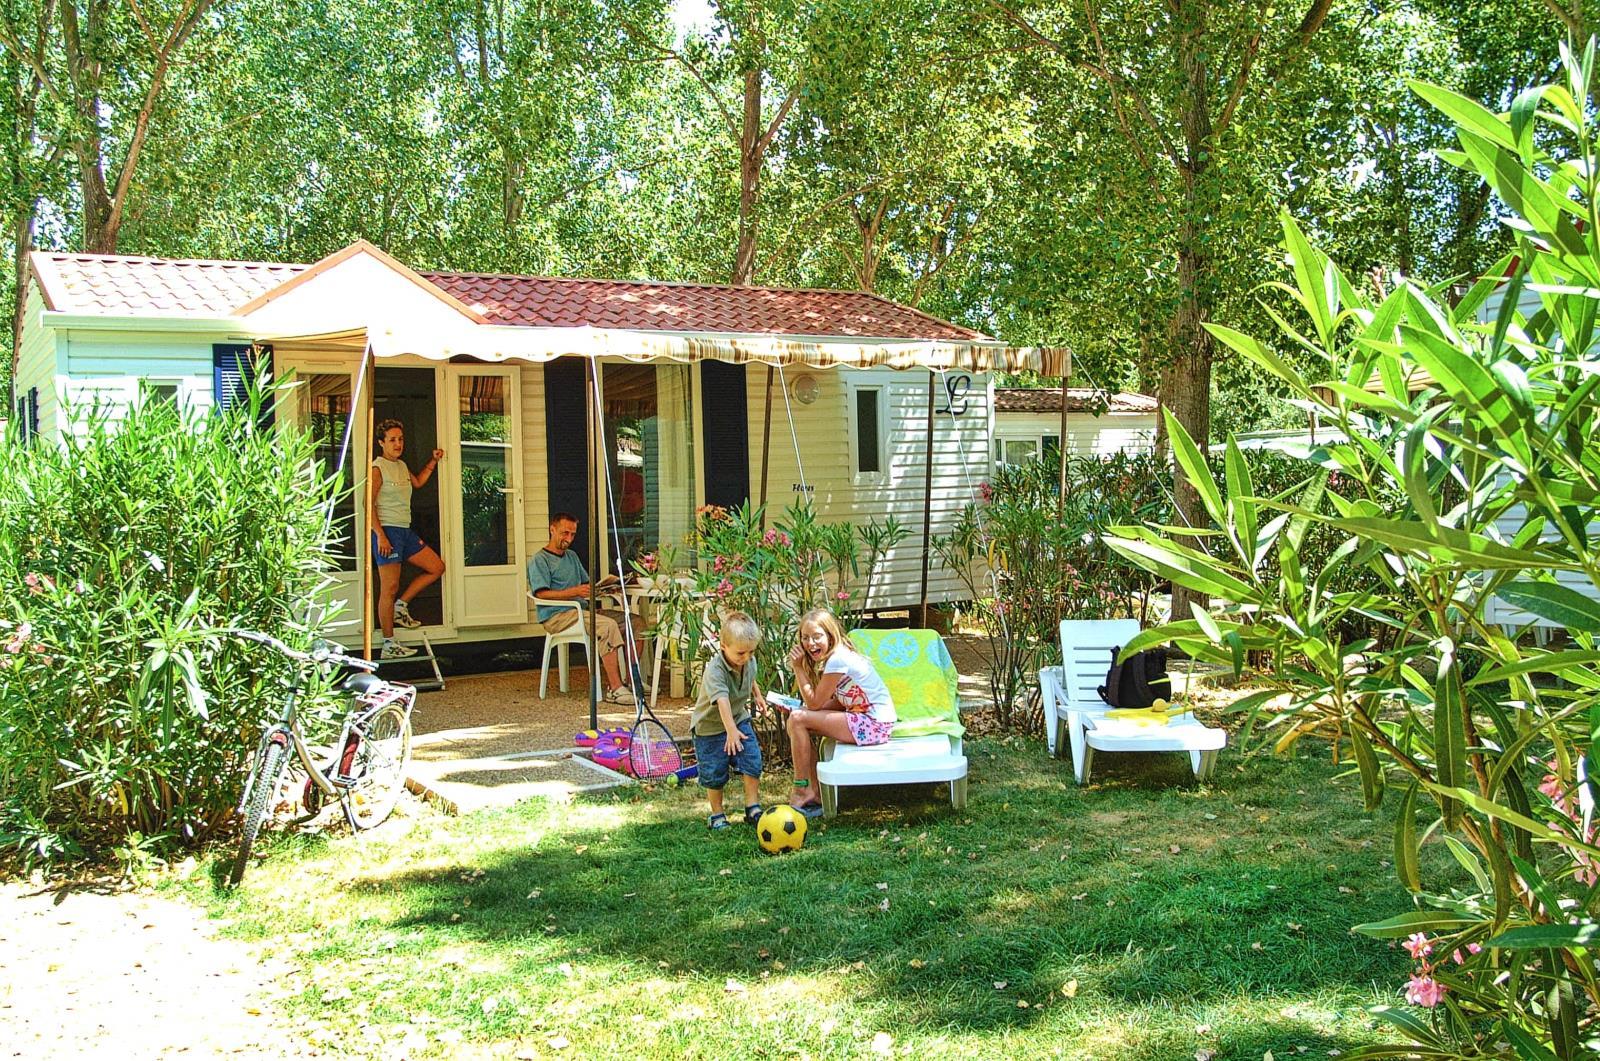 Location - Mexico Classic, Confort - Samedi - 2 Chambres - Camping L'Air Marin